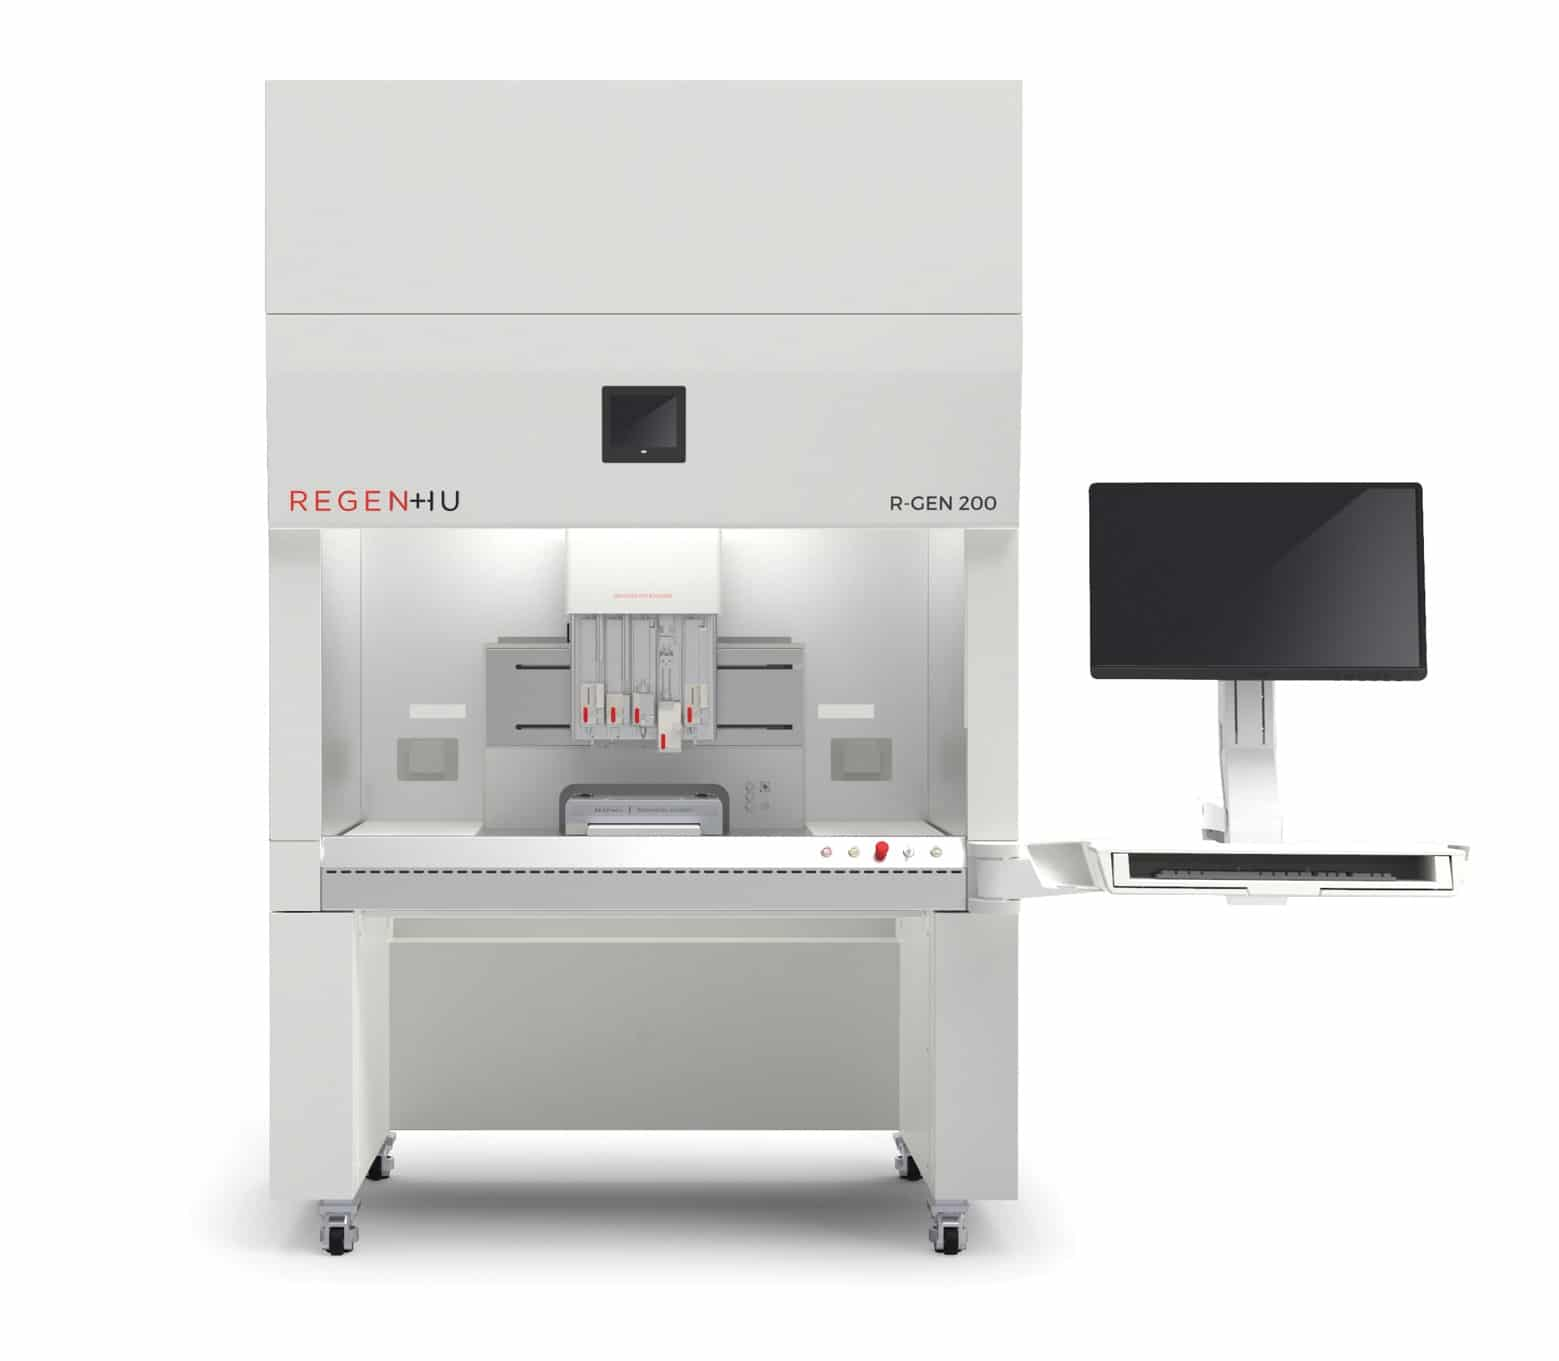 R-GEN-200-REGENHU-Switzerland-3d-bioprinting-instrument-bio-3d-bioprinters-fresh-printing-printheads-modularity-biosafety-cabinets-003